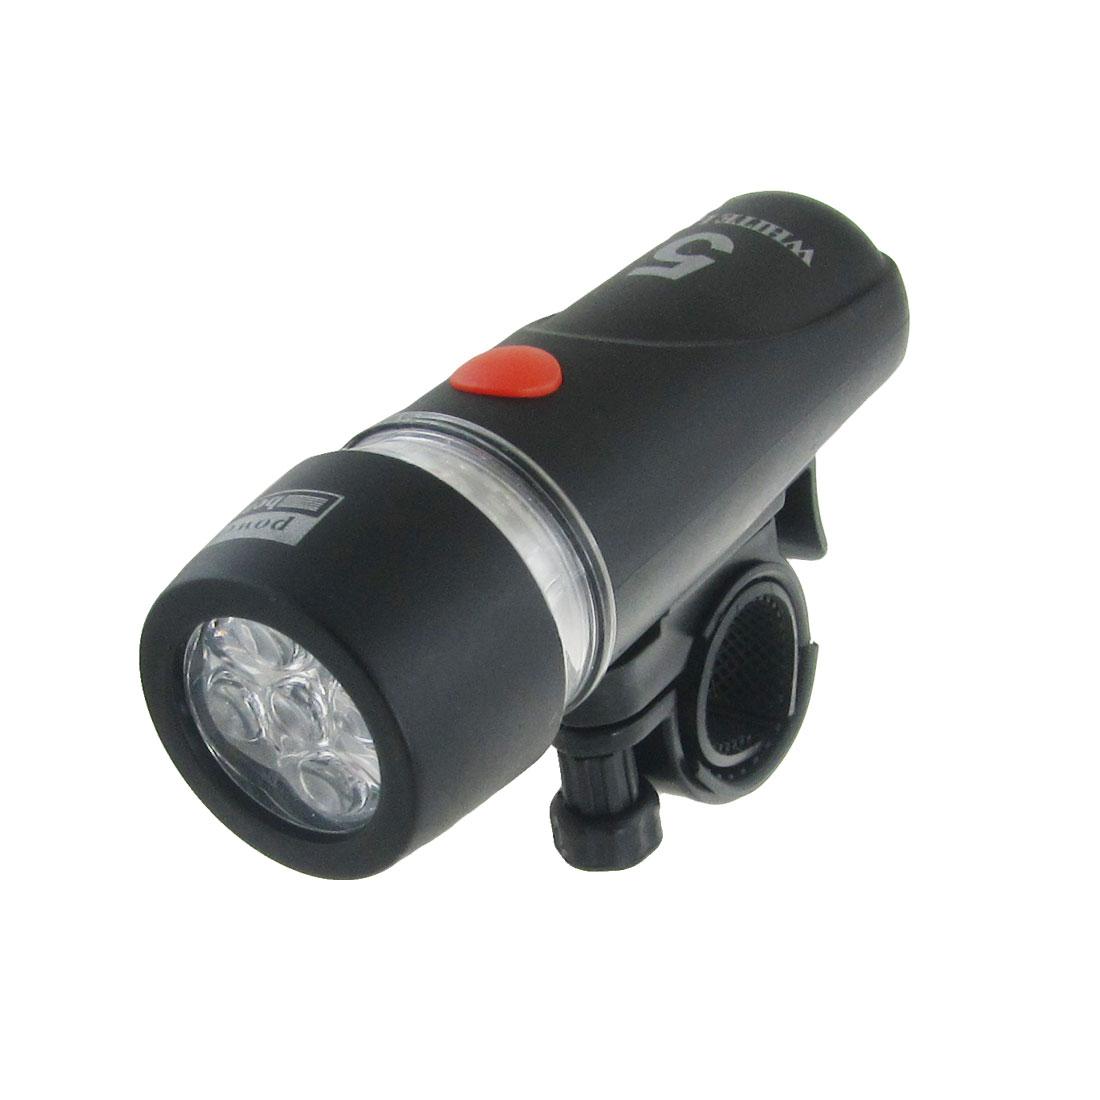 Bike Bicycle White LED Flashing Light Headlight Torch Black